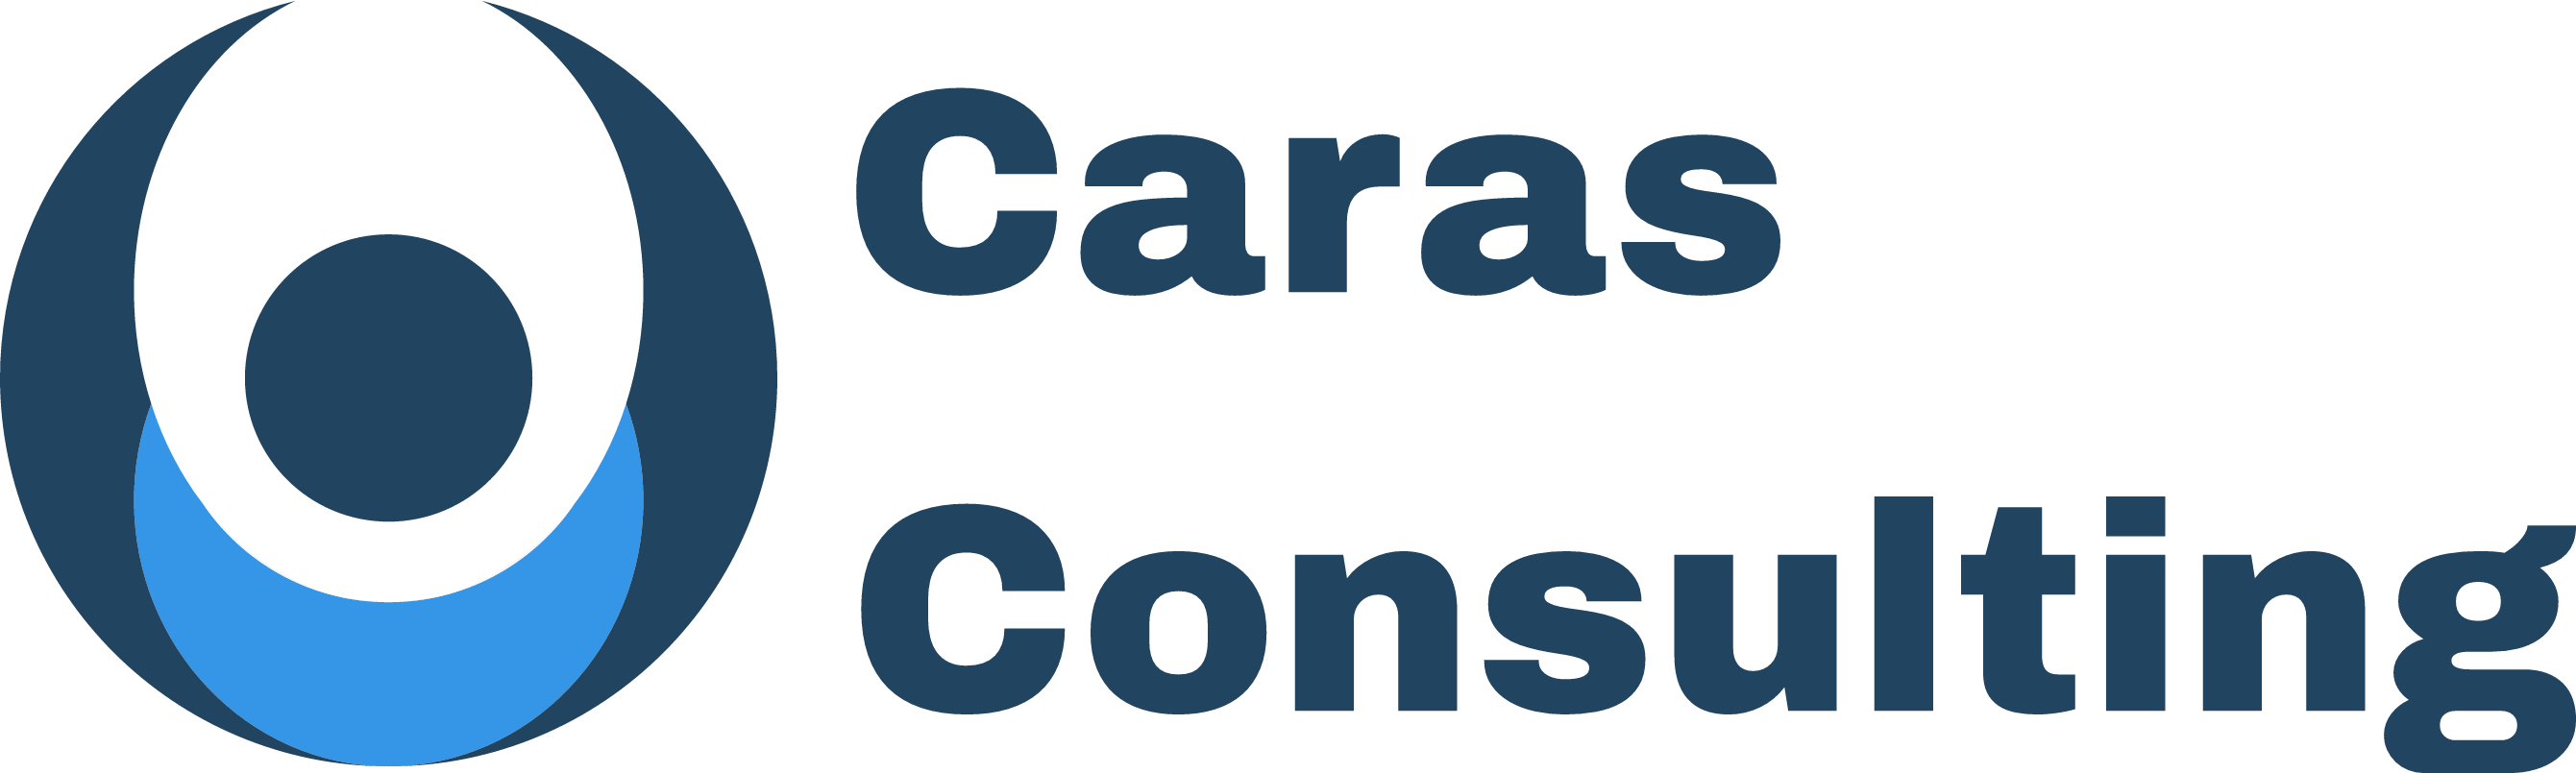 Caras Consulting Inc.